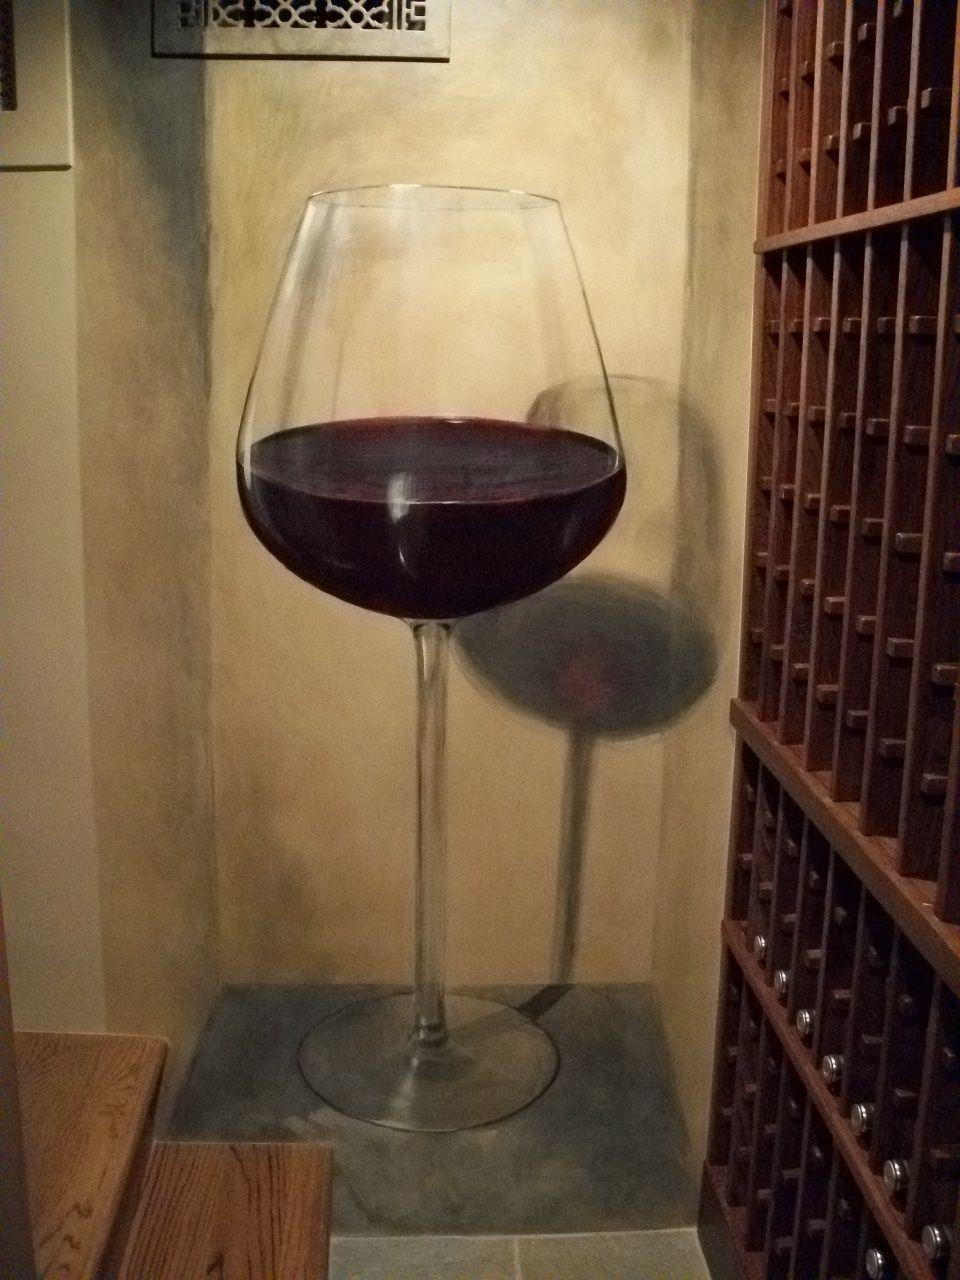 Giant Wine Glass Photo Google Search Vino Wine Giant Wine